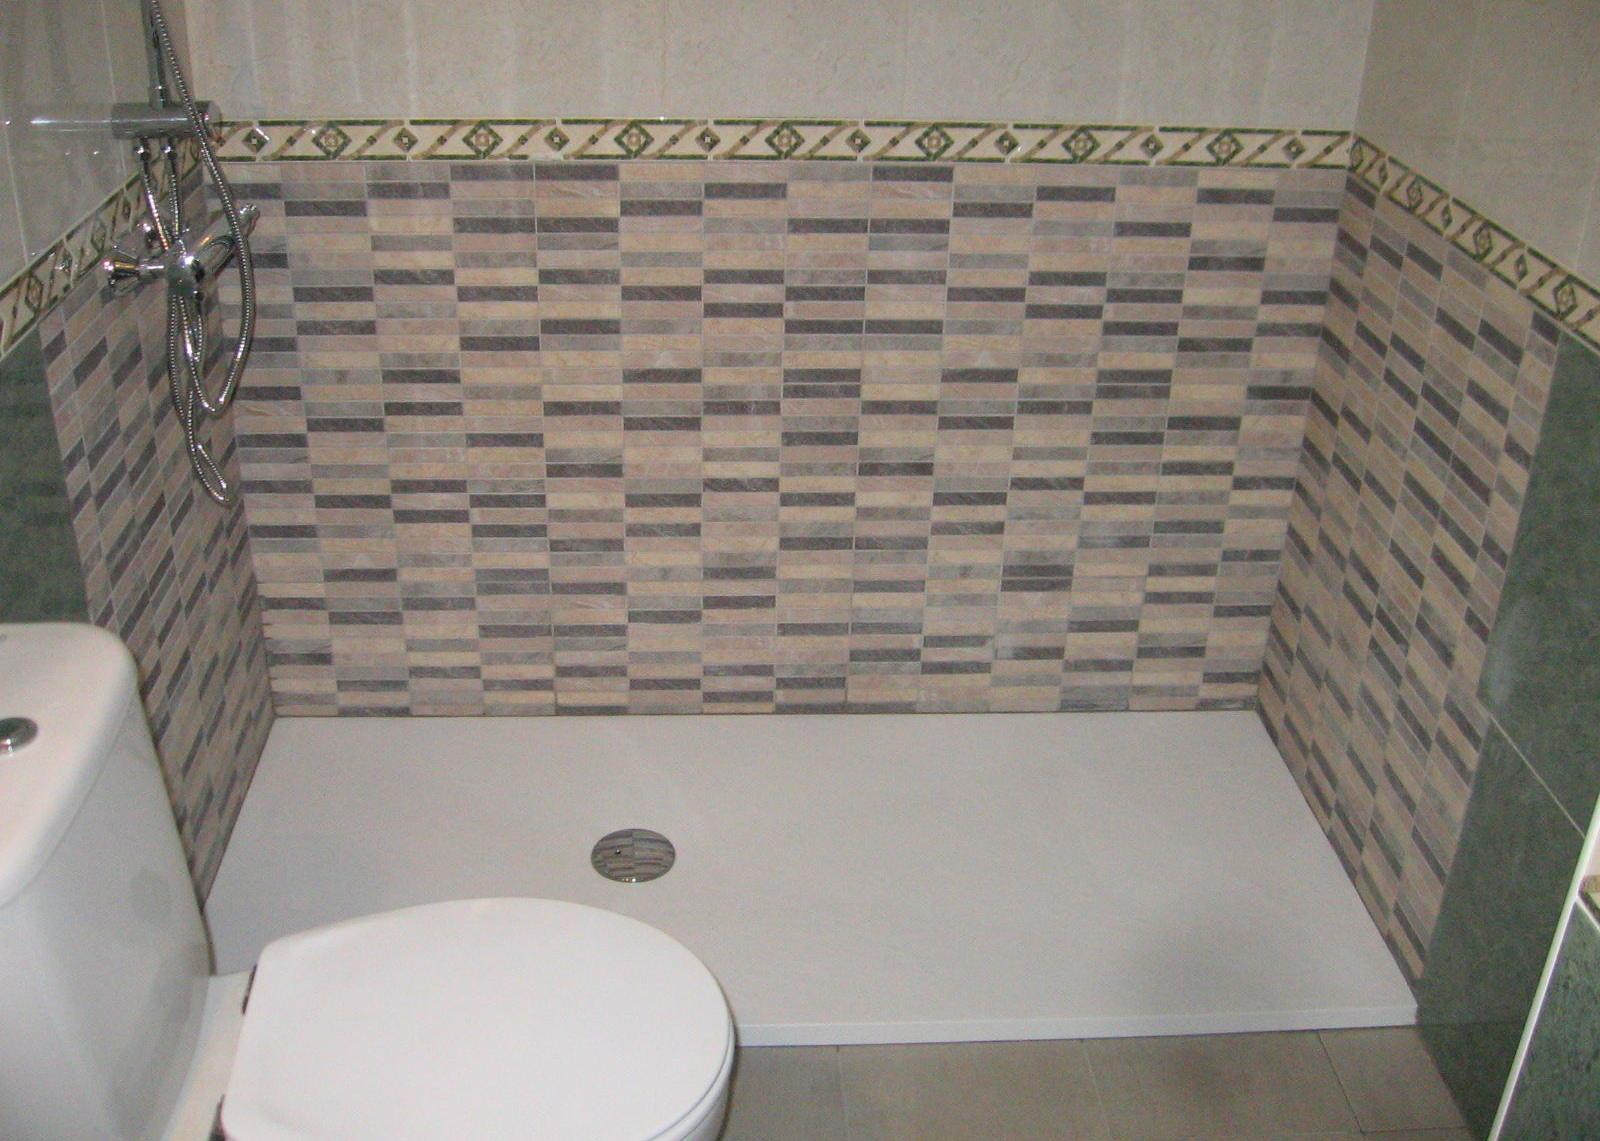 Cambio de ba era por plato de ducha servicios de cuin factory - Banera o plato de ducha ...